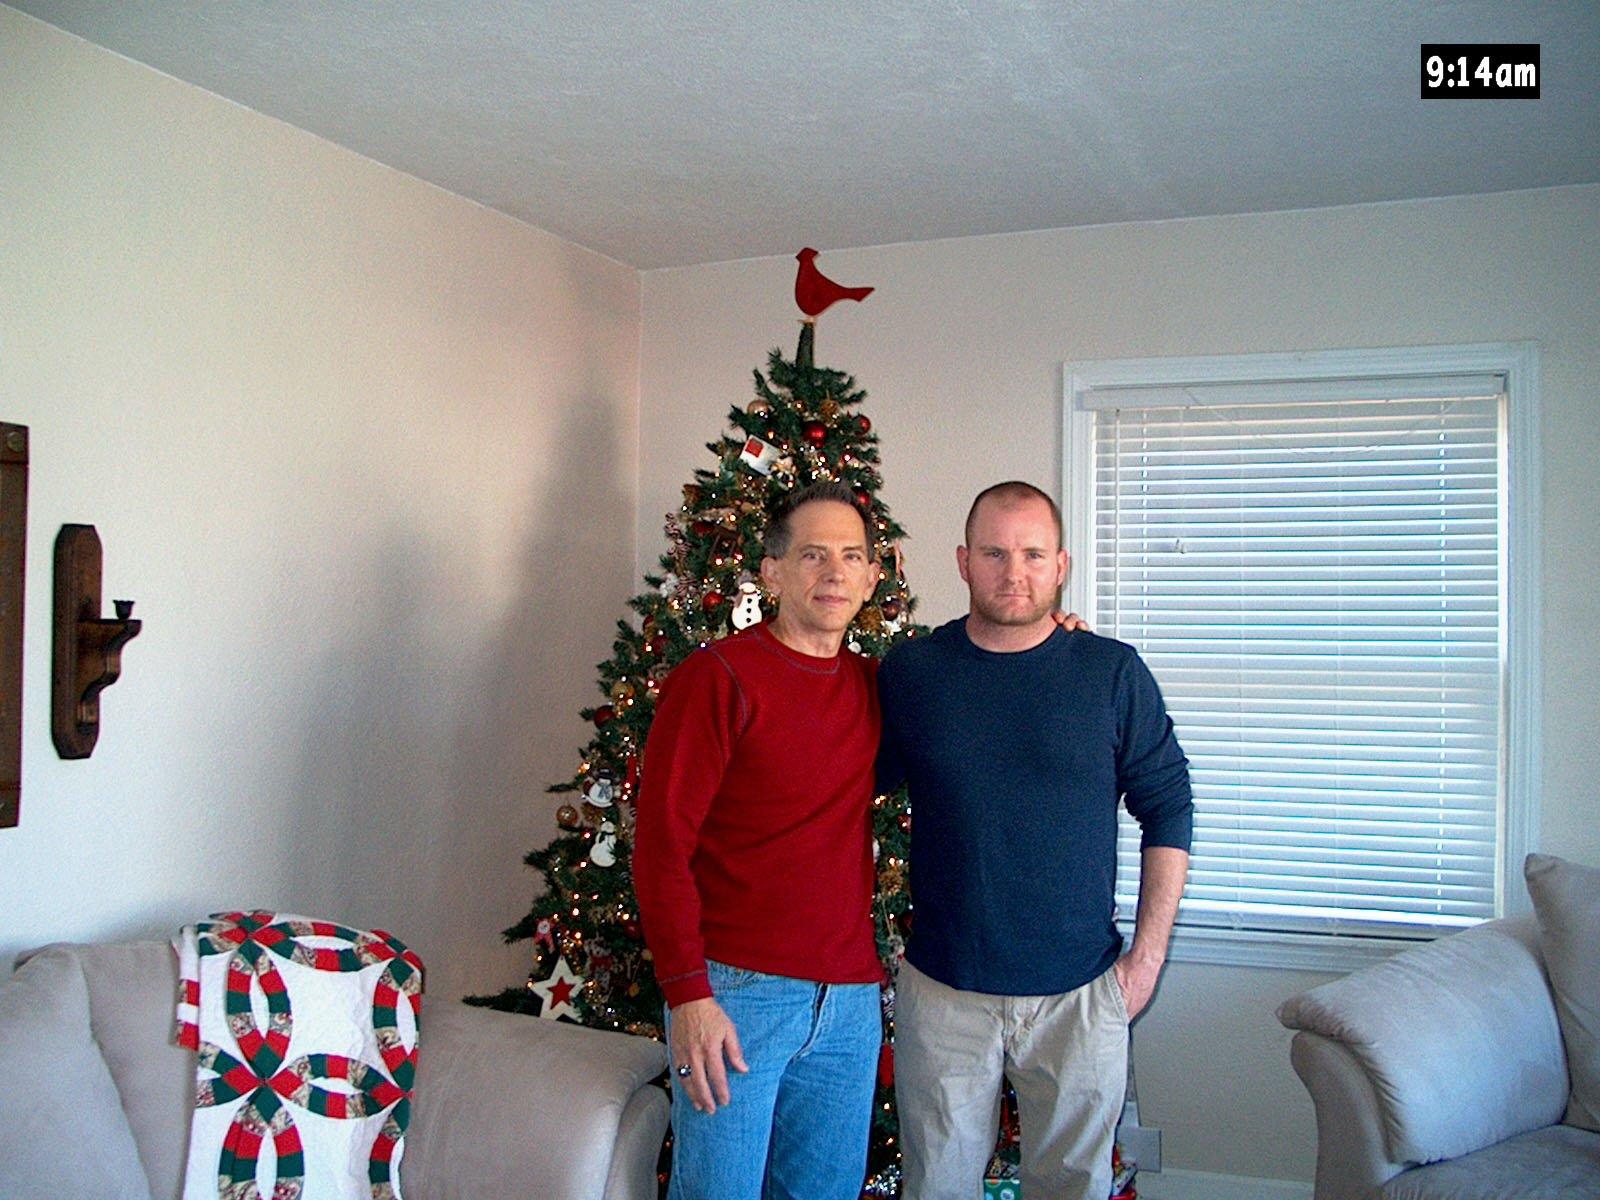 robert-mccormack-and-robb-mccormack-christmas-2007